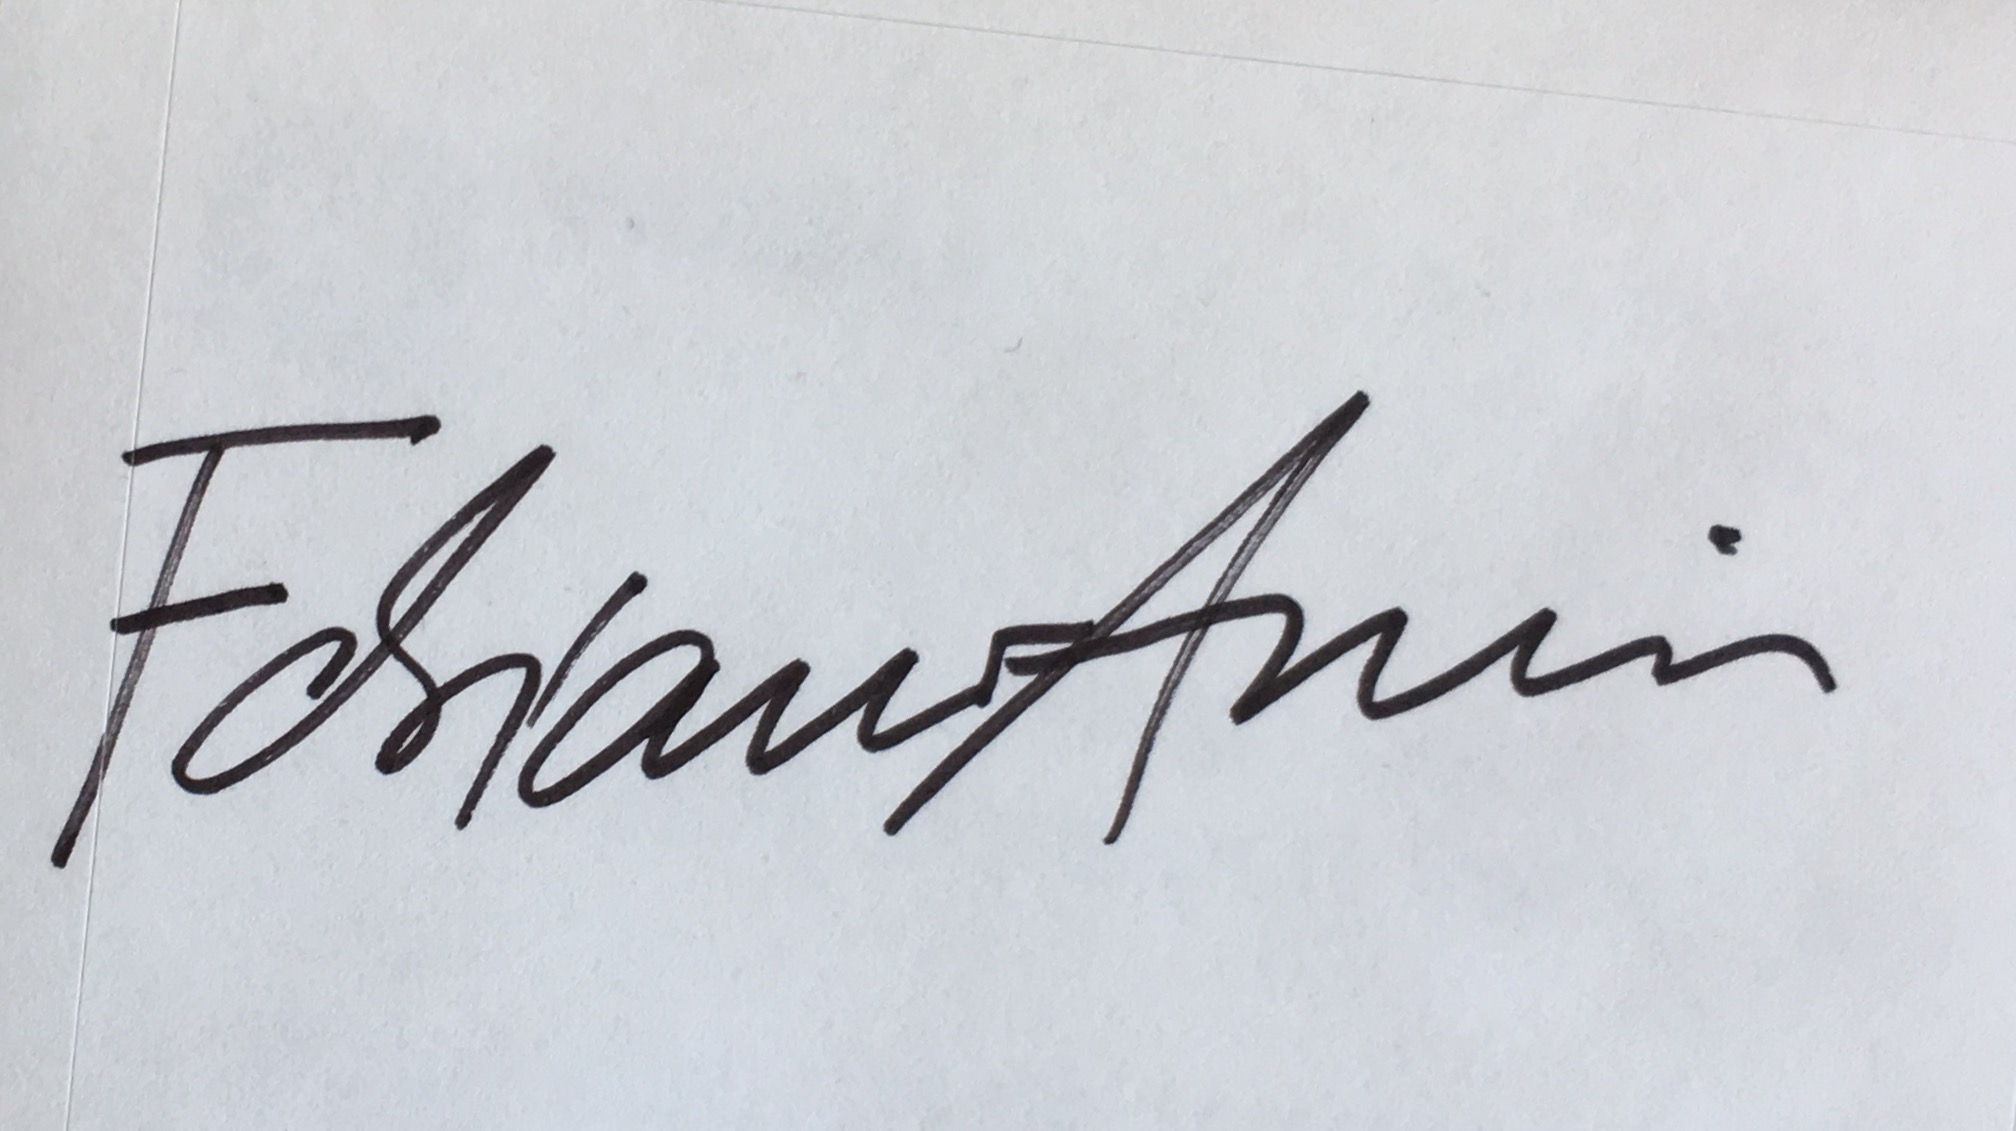 Fabiano Amin Signature